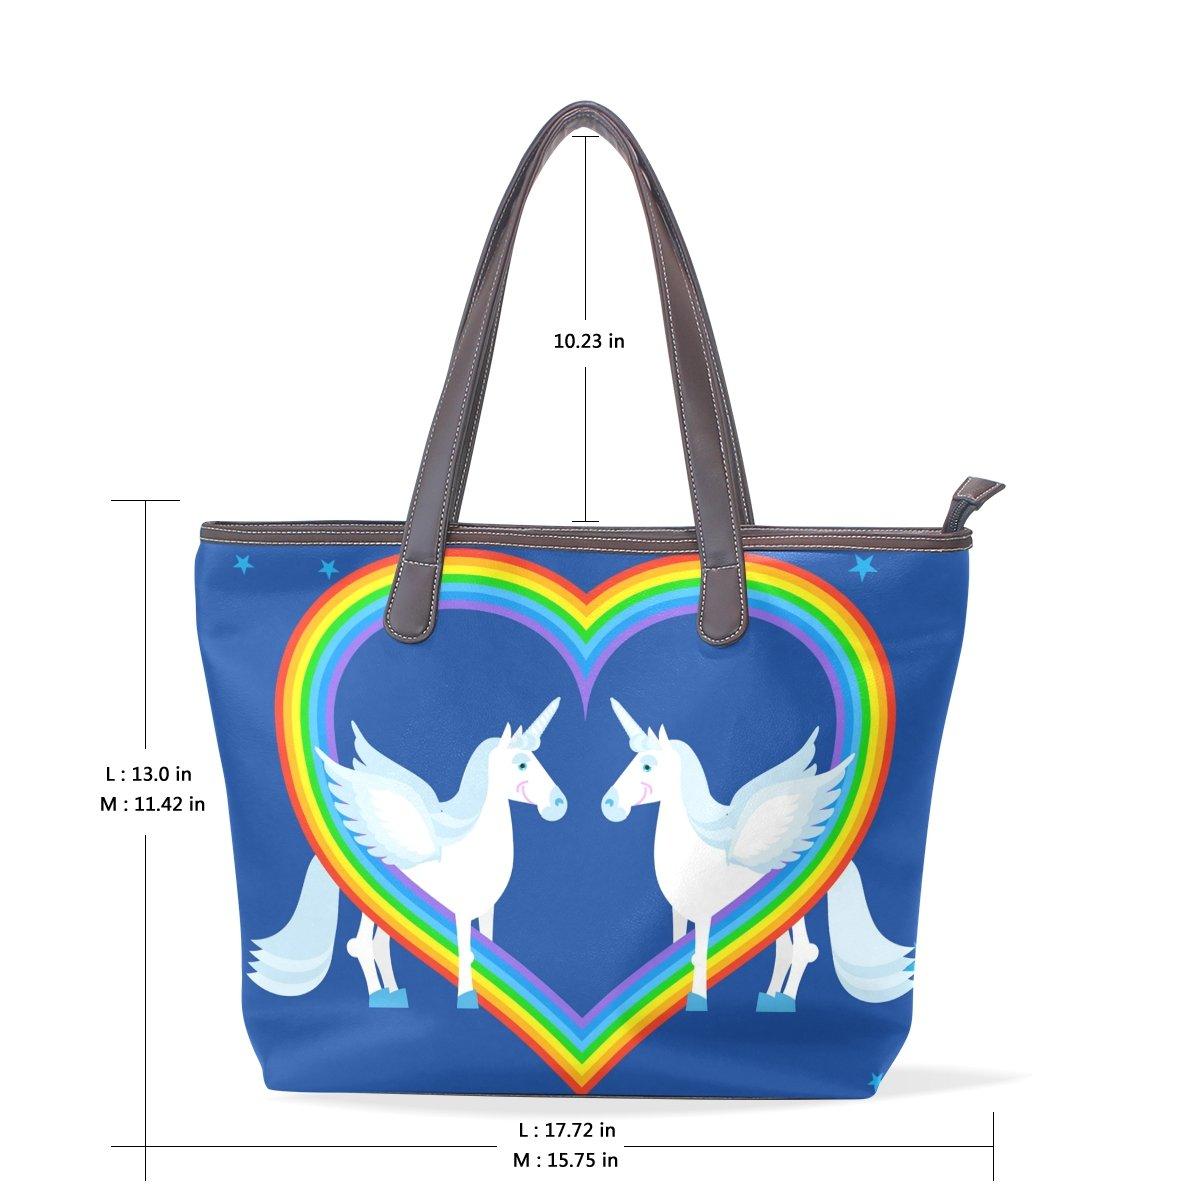 IMOBABY Unicorn Leather Tote Bag Handbag Shoulder Bag for Women Girls